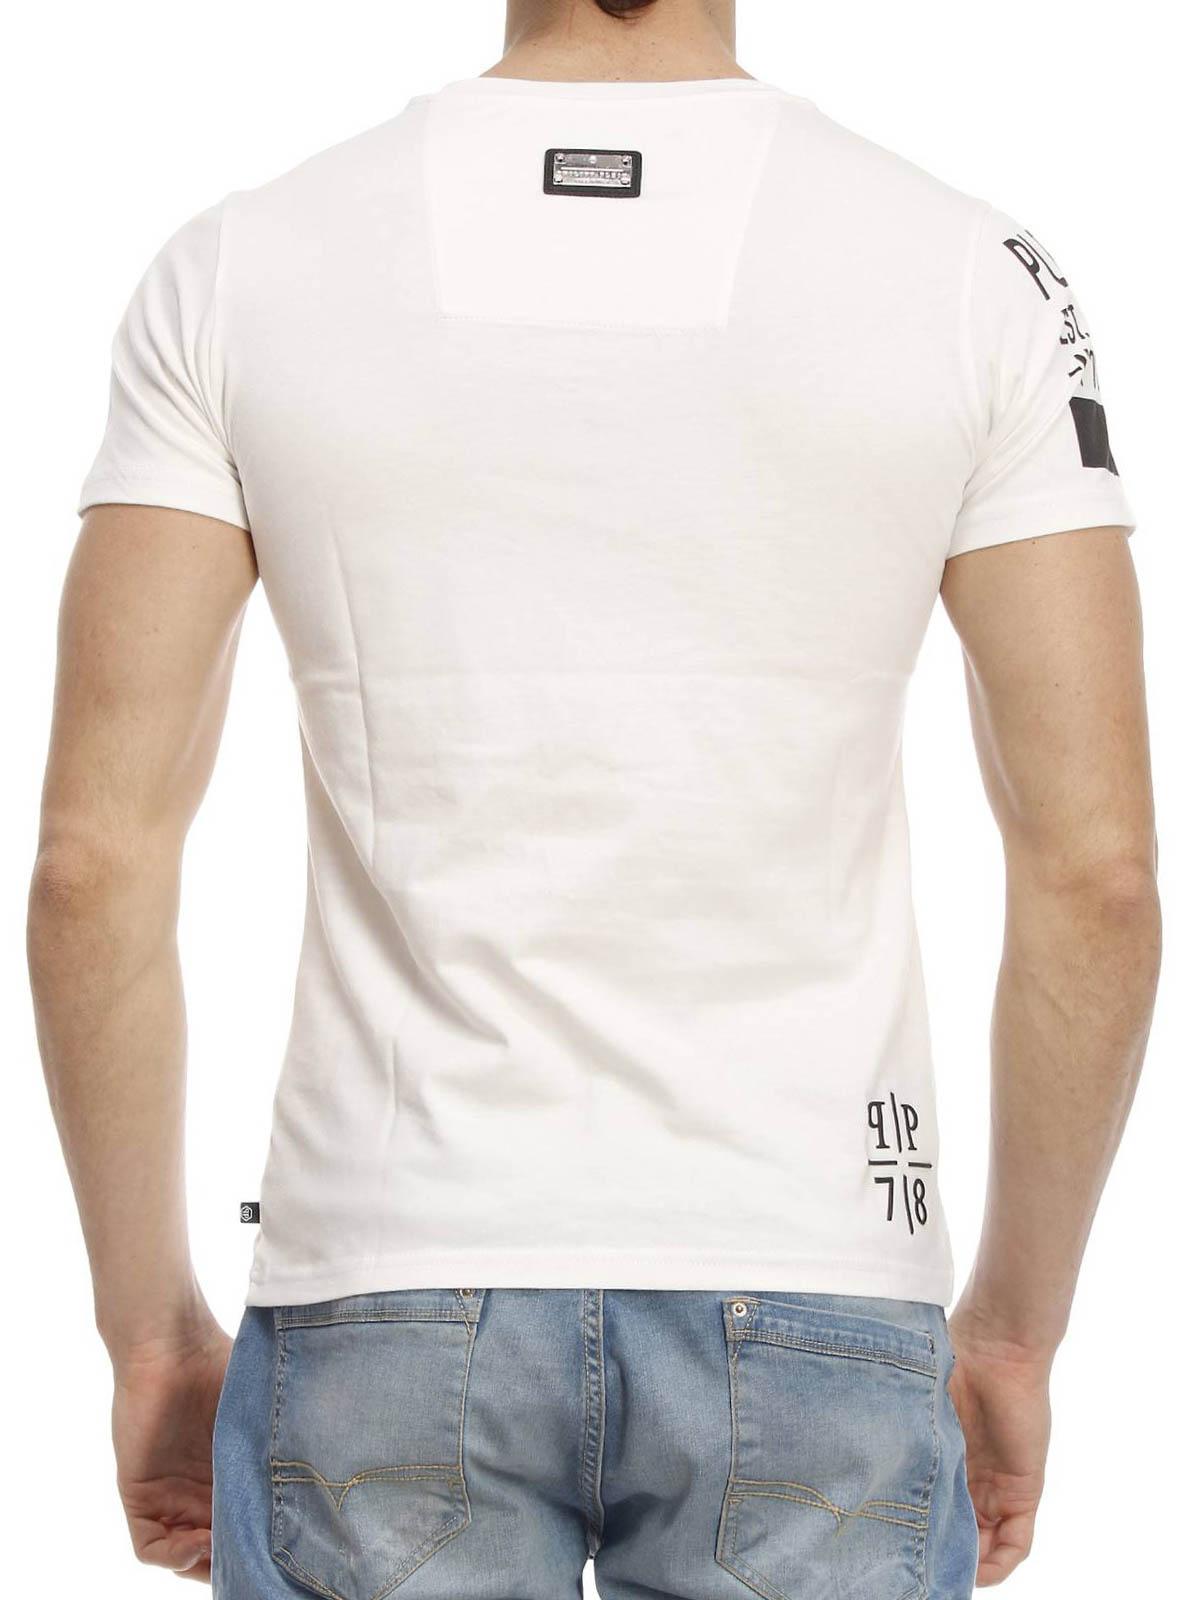 philipp plein philipp t shirt t shirts hm342542 01. Black Bedroom Furniture Sets. Home Design Ideas